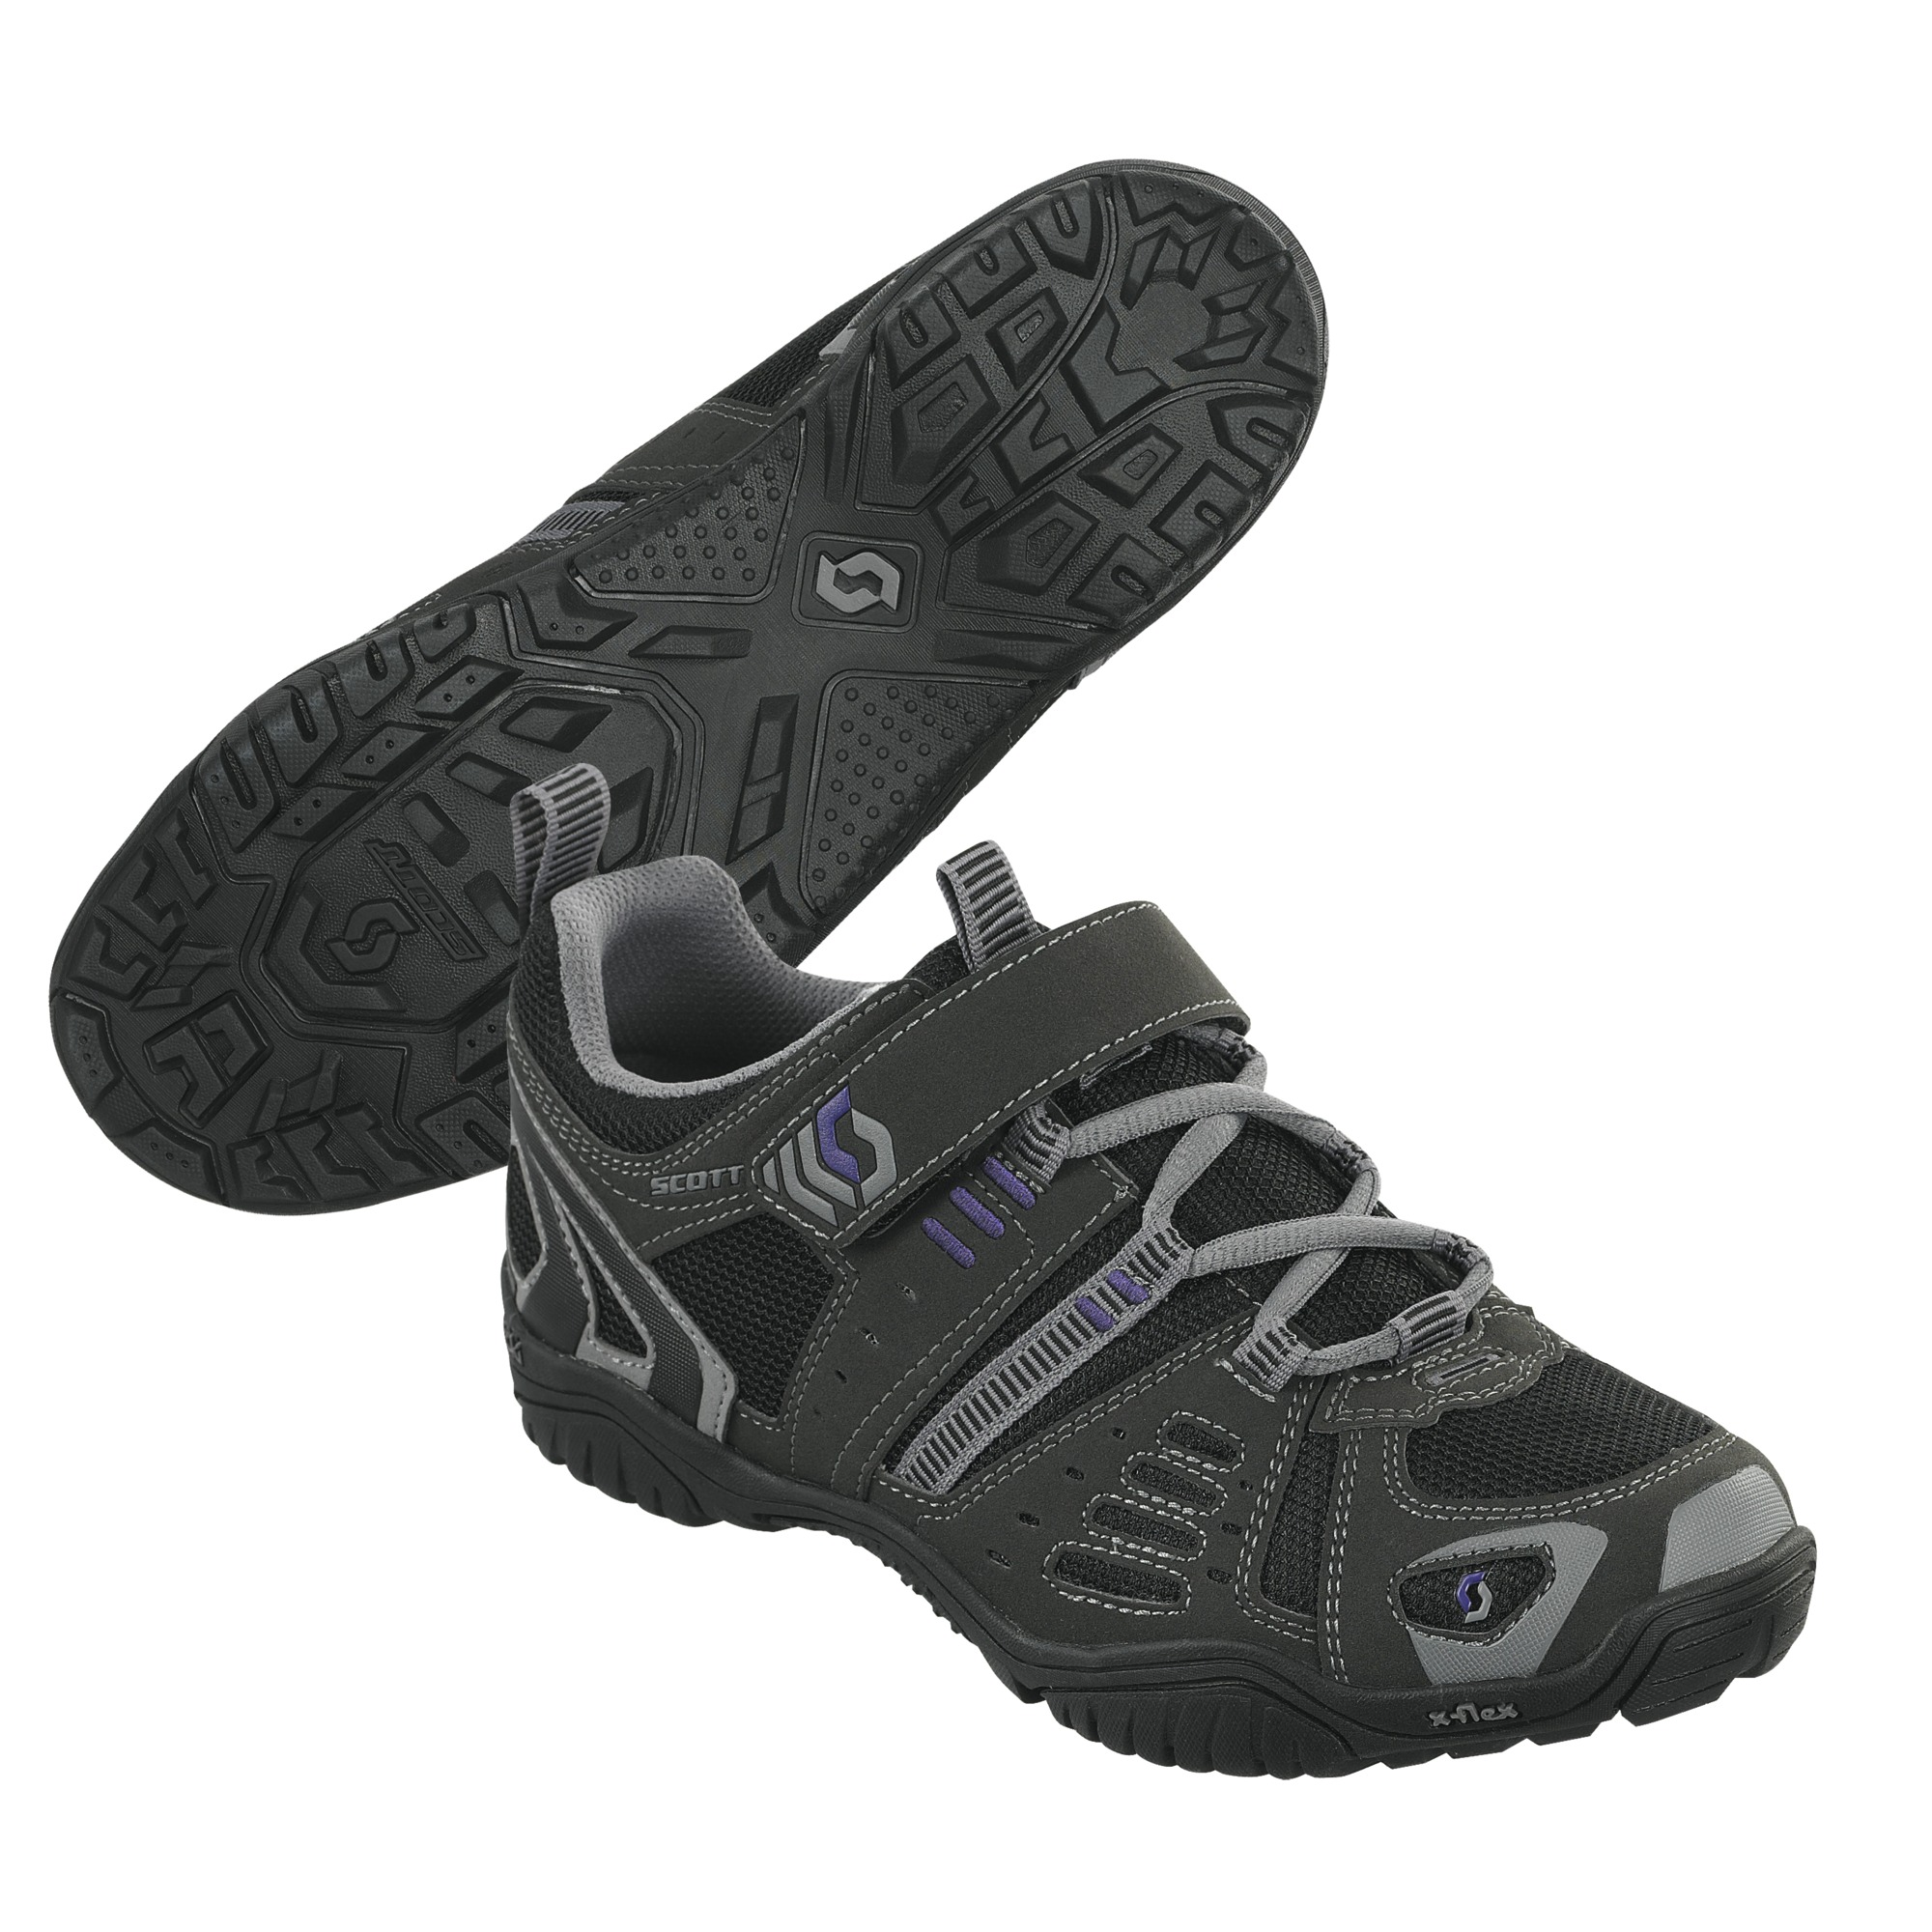 d137d8b761 2016 Scott Trail Womens SPD Shoe £65.99